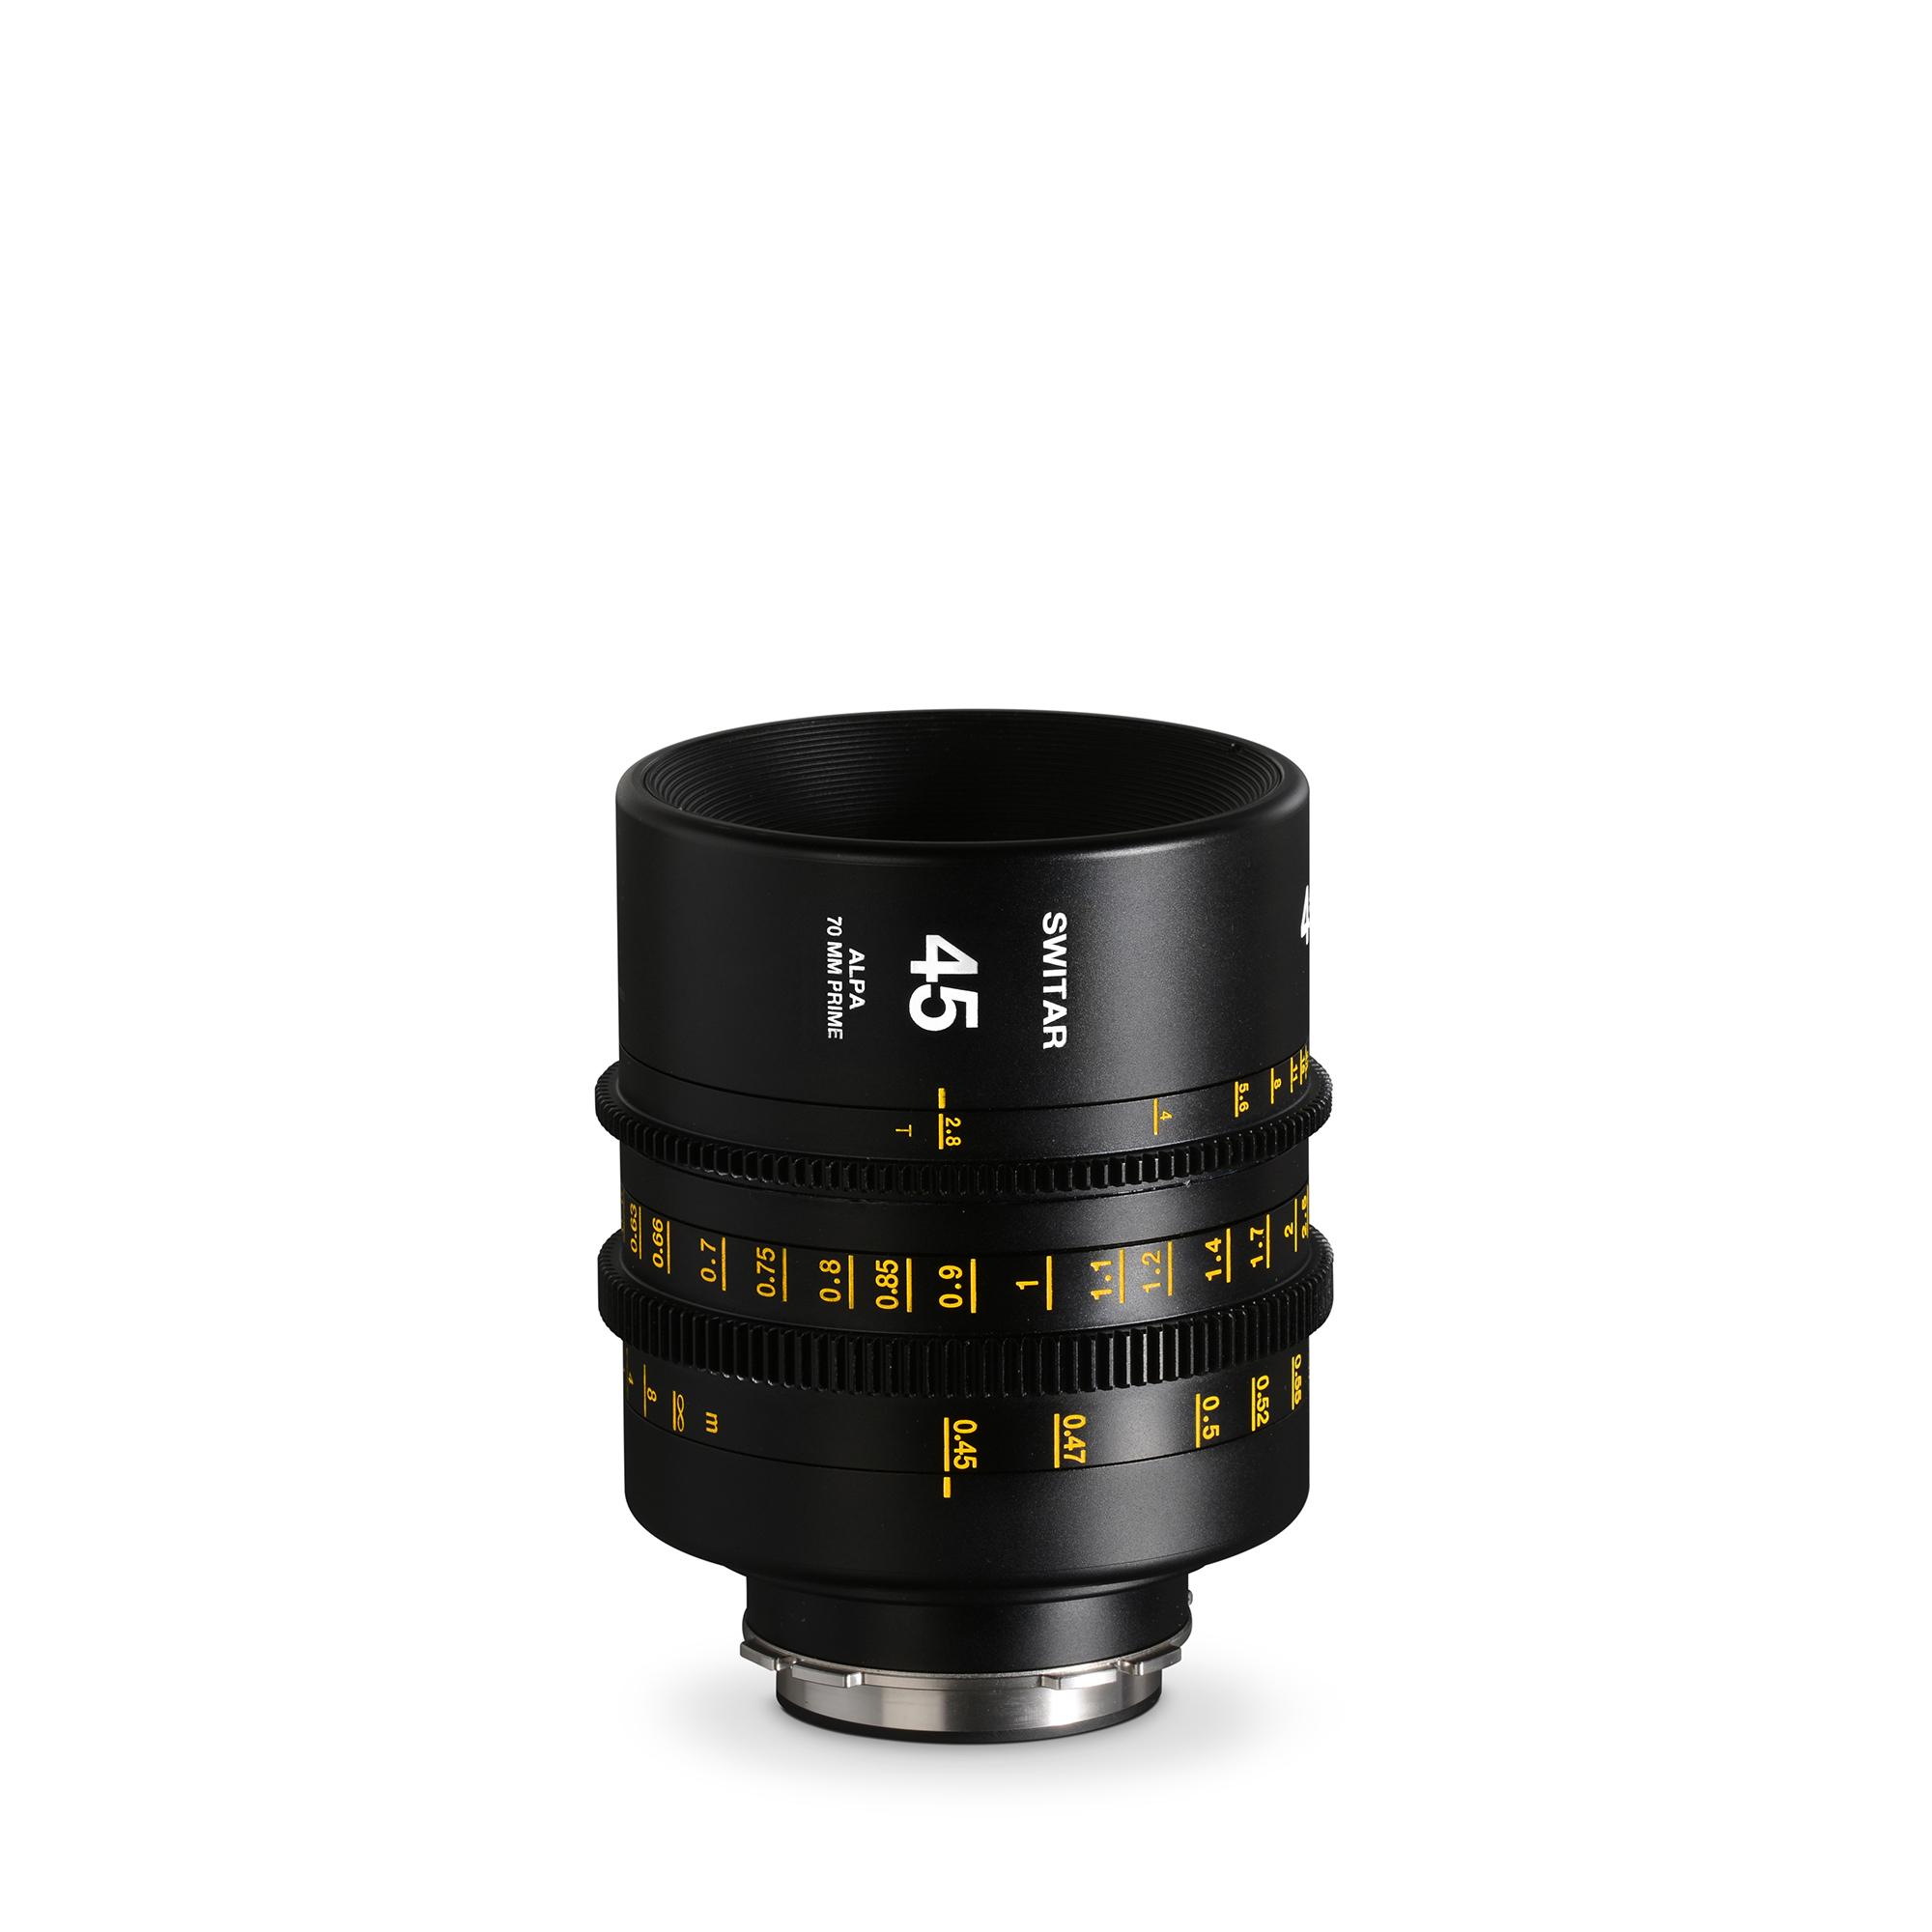 ALPA Коммутатор 2,8/45 мм Cine Prime IC 70 мм - метры